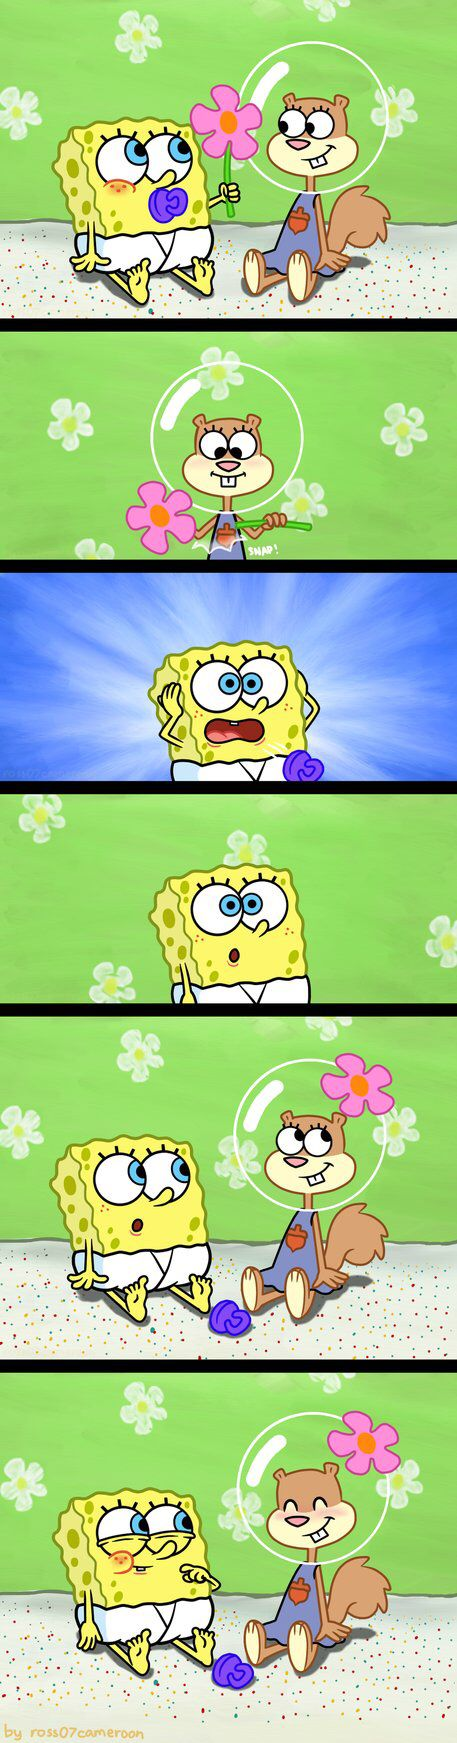 Random Flower Mini-Comic by Allenare on @DeviantArt http://www.amazon.com/SoundPie-Universal-Earphone-Microphone-Resistant/dp/B01AI26PYY/ref=sr_1_1?ie=UTF8&keywords=apple+earbuds